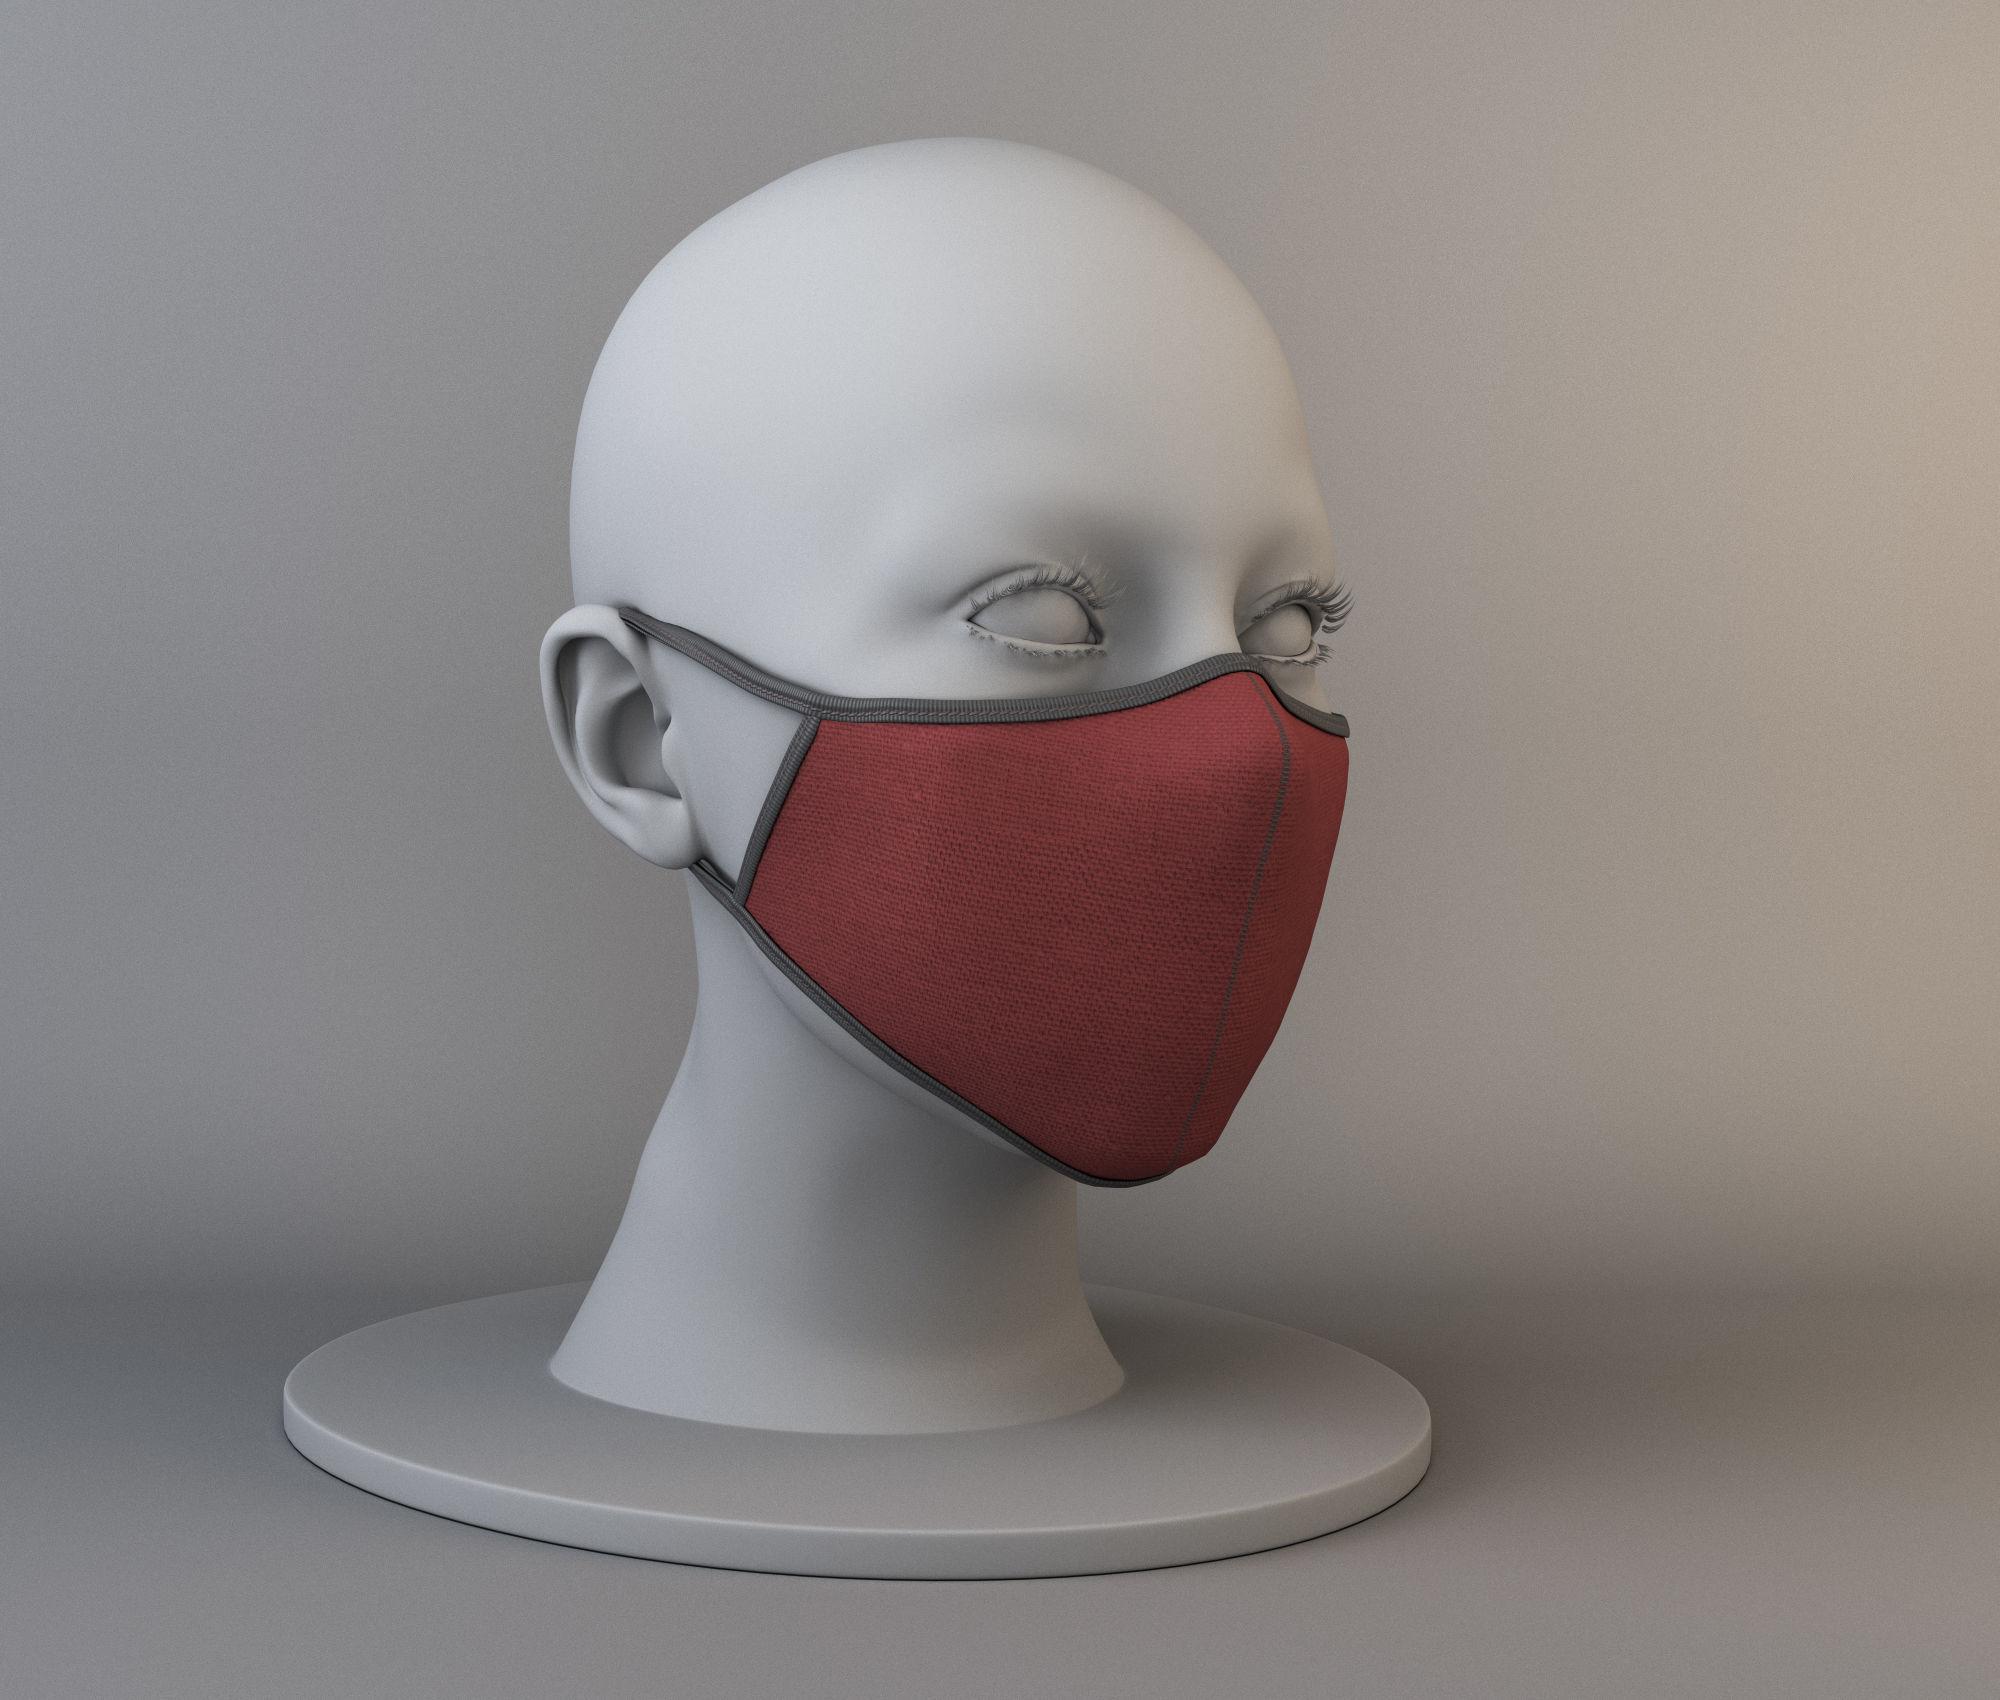 Reusable medical mask